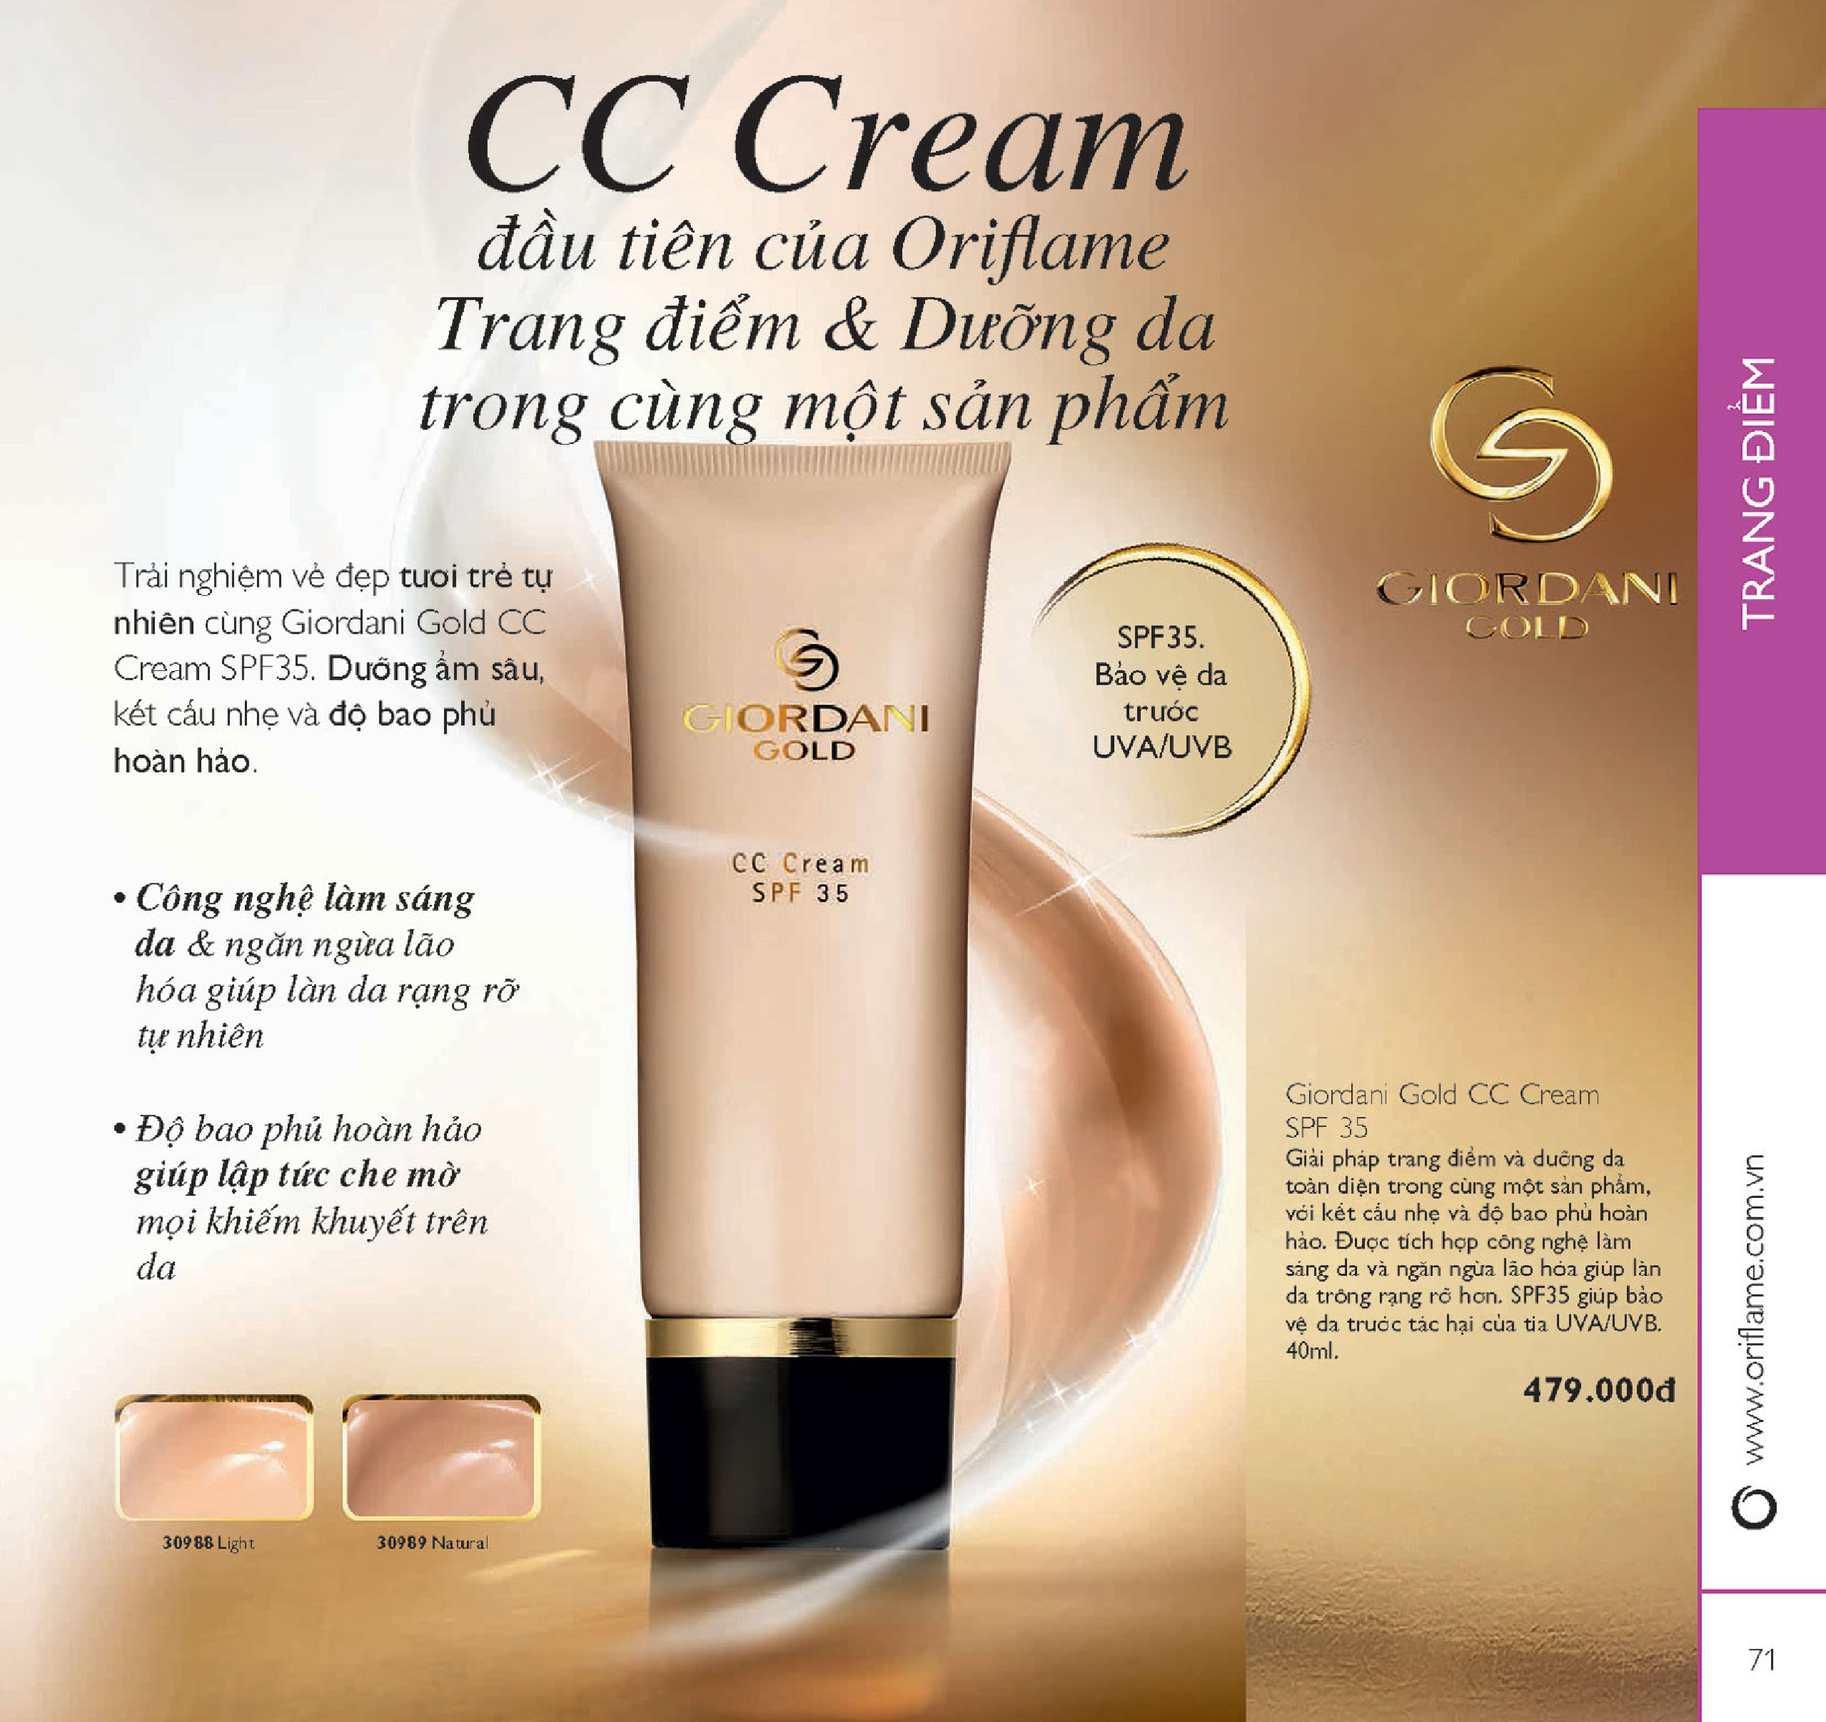 Catalogue My Pham Oriflame 7 2015 Calameo Downloader Giordani Gold Cc Cream Spf 35 Page 71